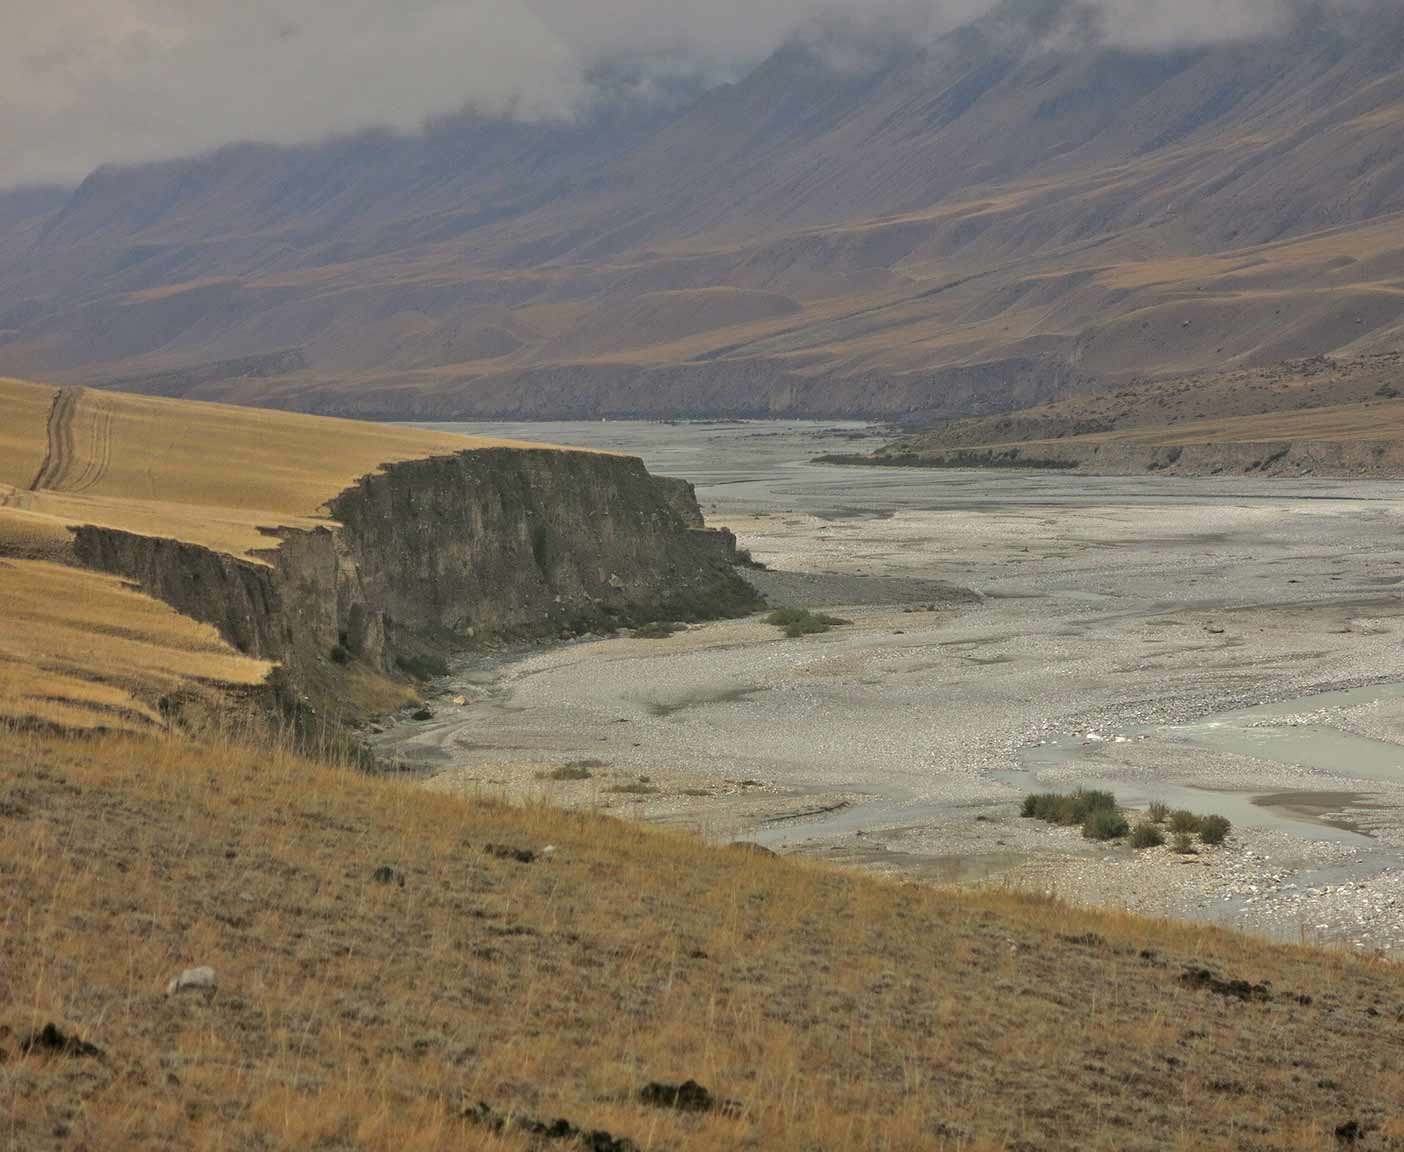 Kirgistan-kirgistan-wohnmobil-landschaft-natur-klima-wetter